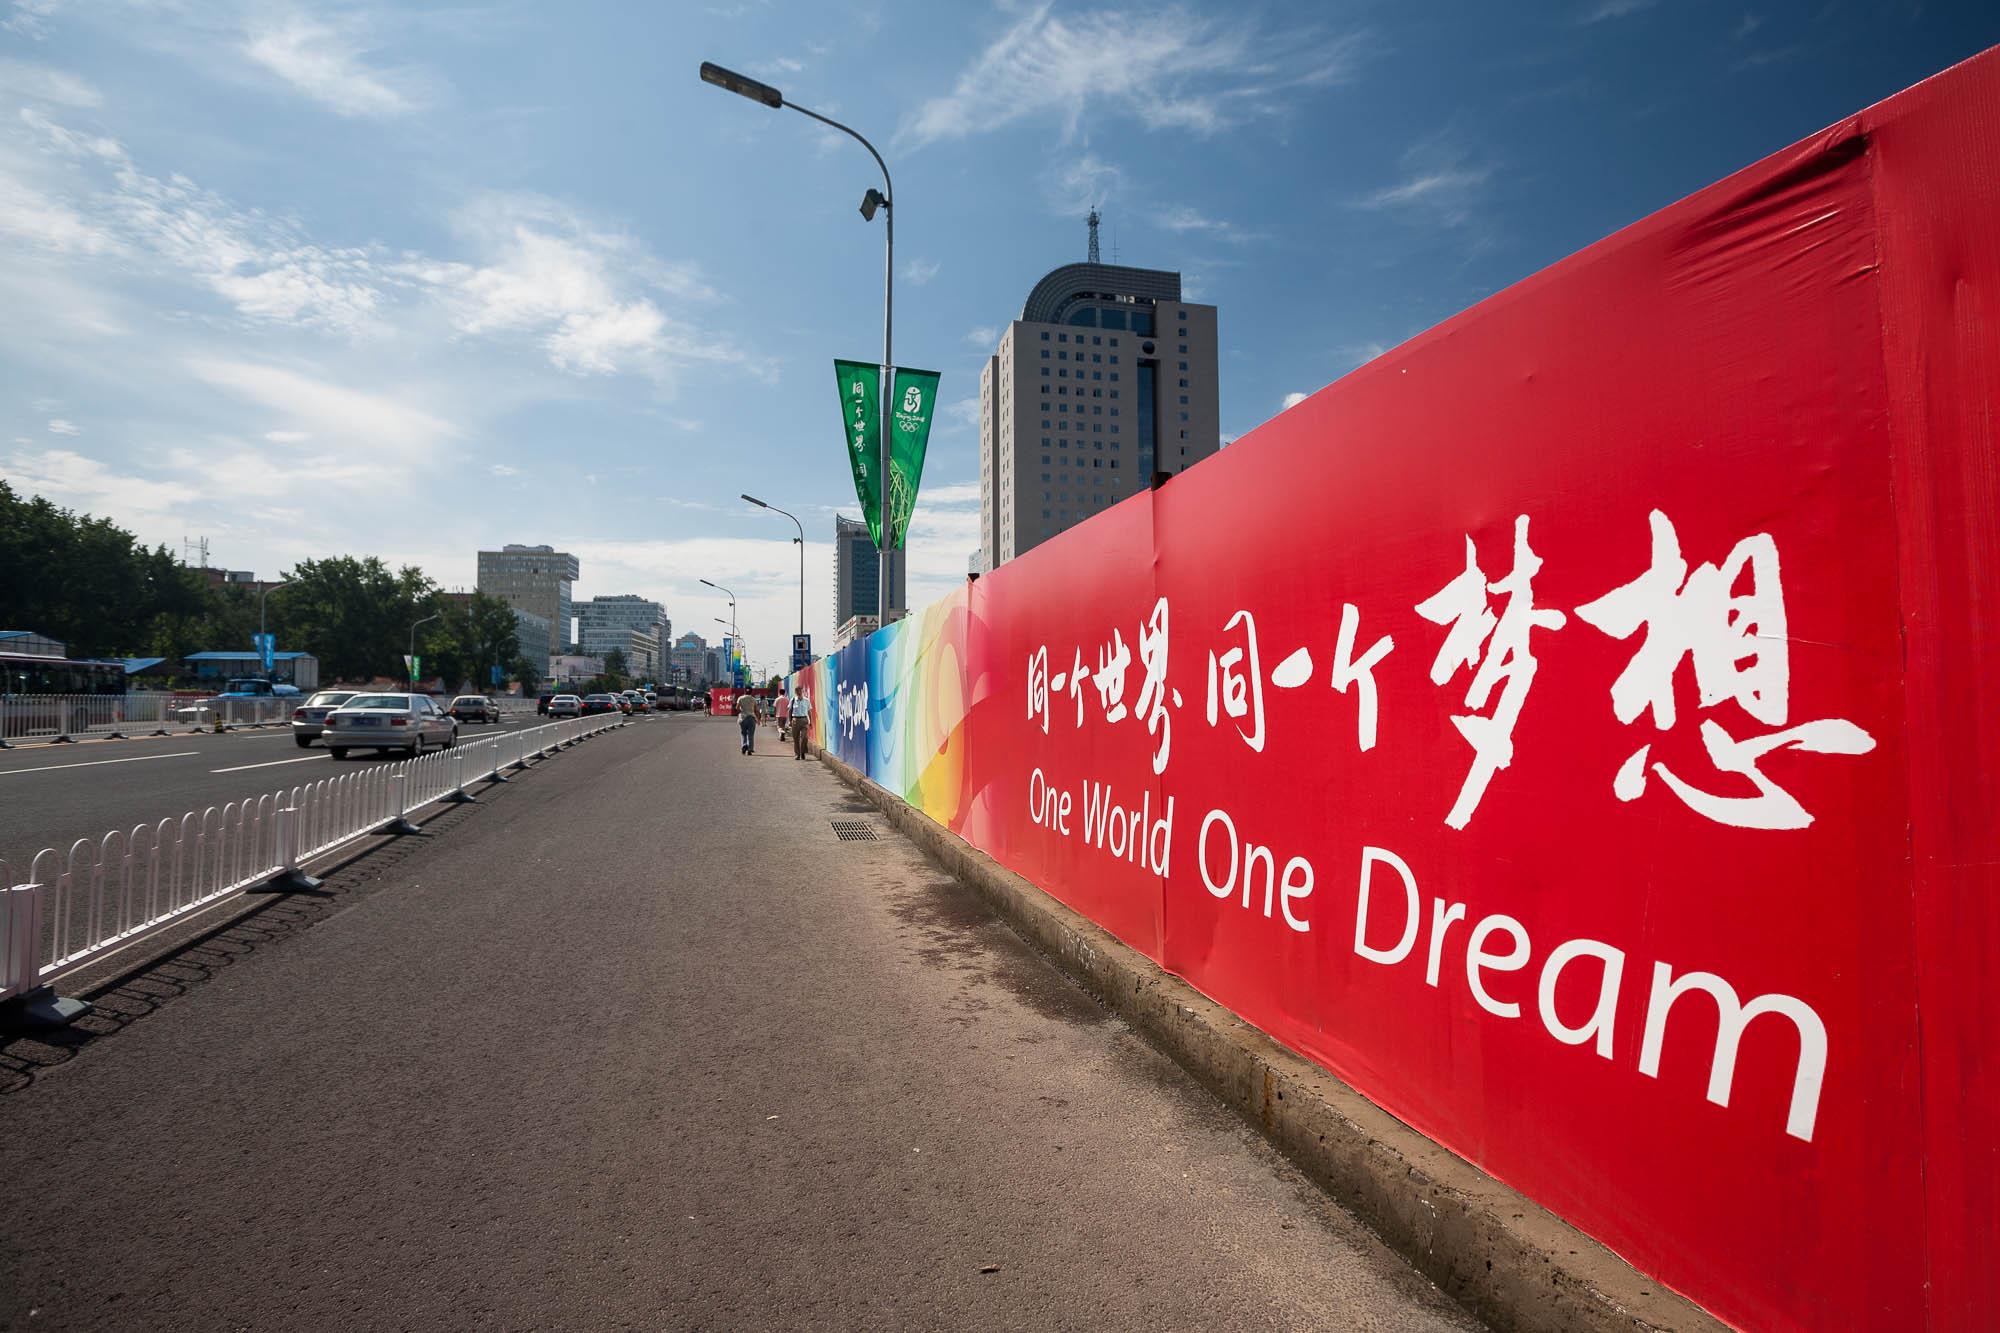 one world one dream